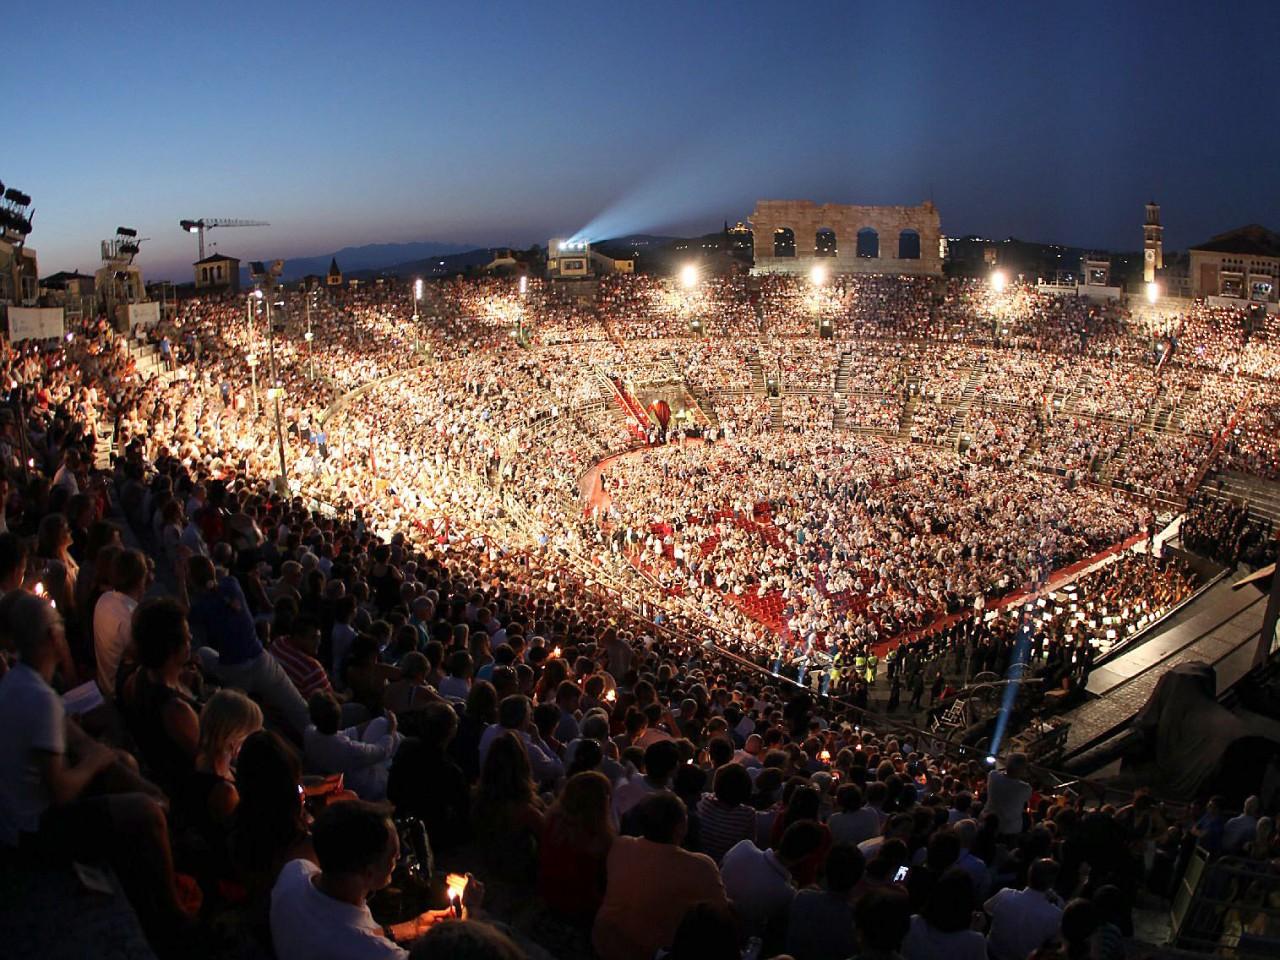 Opera and Music Festivals